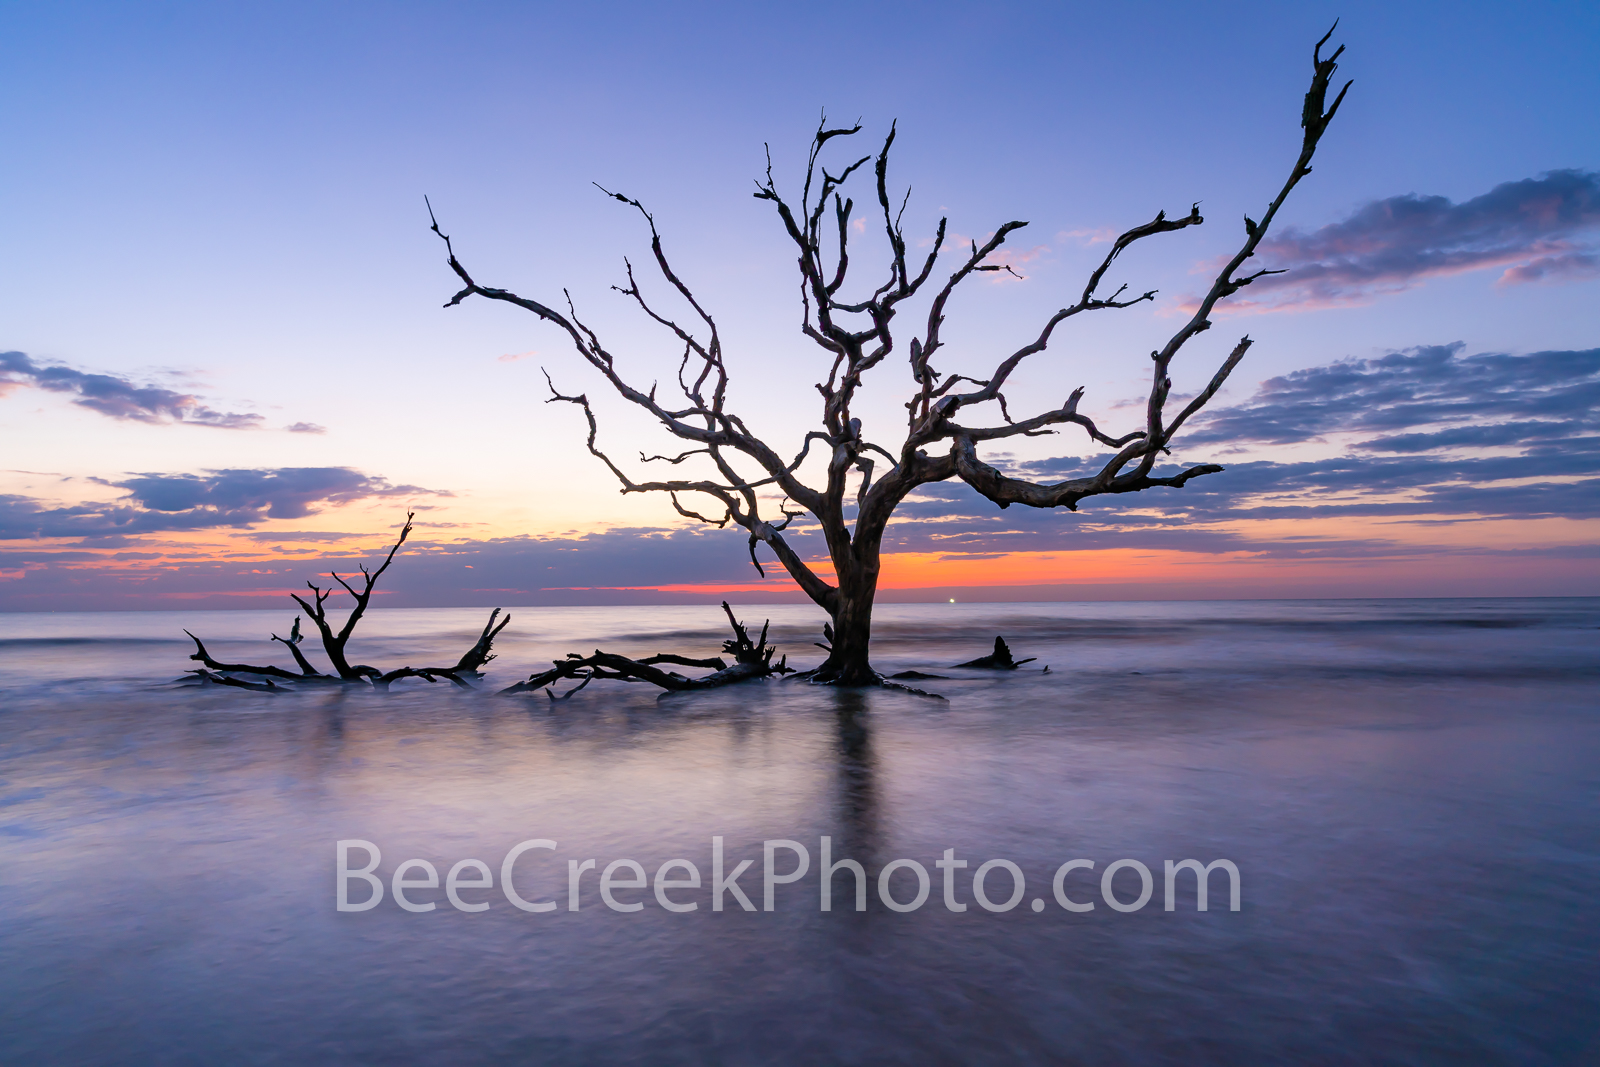 Driftwood beach, driftwood, jekyll island, beach, fiery, red, orange, pink, dawn, sunrise, silouette, deadwood, tree, tide, surf, firey, color, tide rolled in, barrier island, alantic coast, georgia, ocean, golden isles